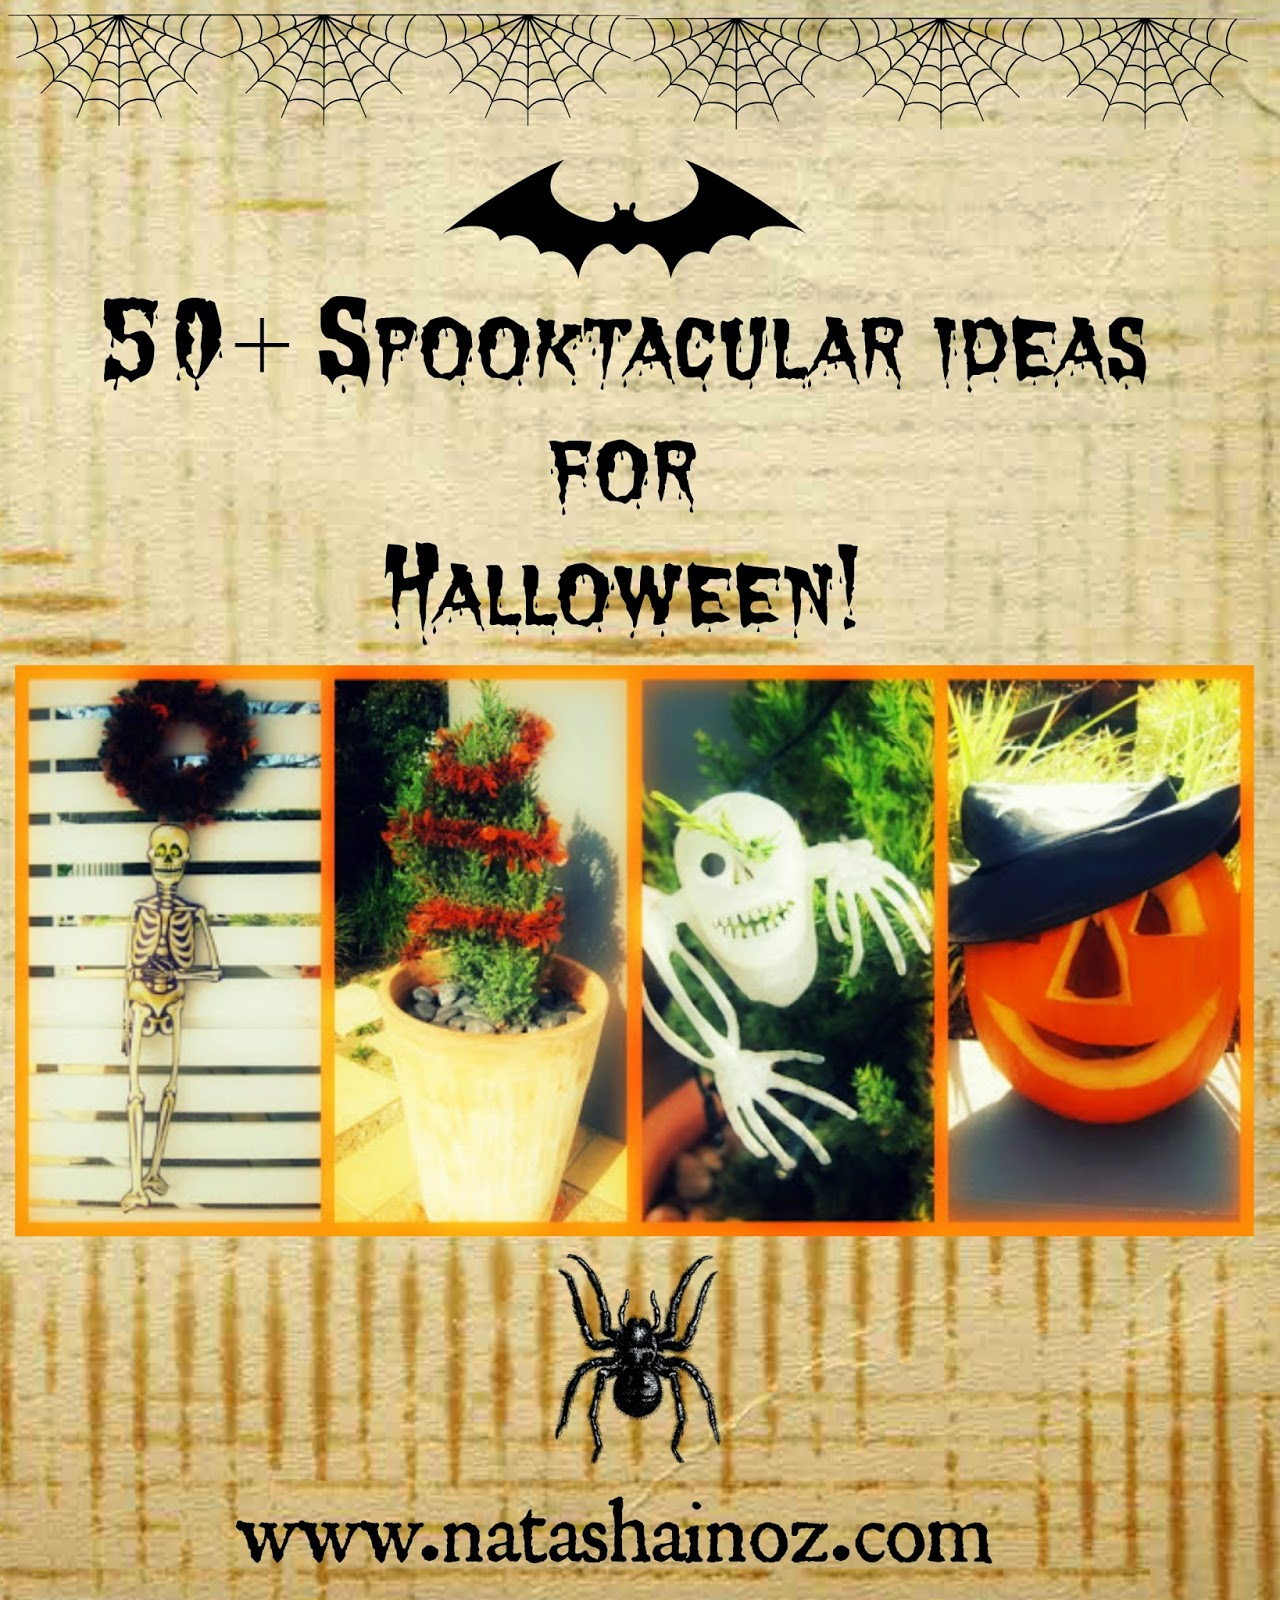 50+ Spooktacular Halloween Ideas via www.natashainoz.com